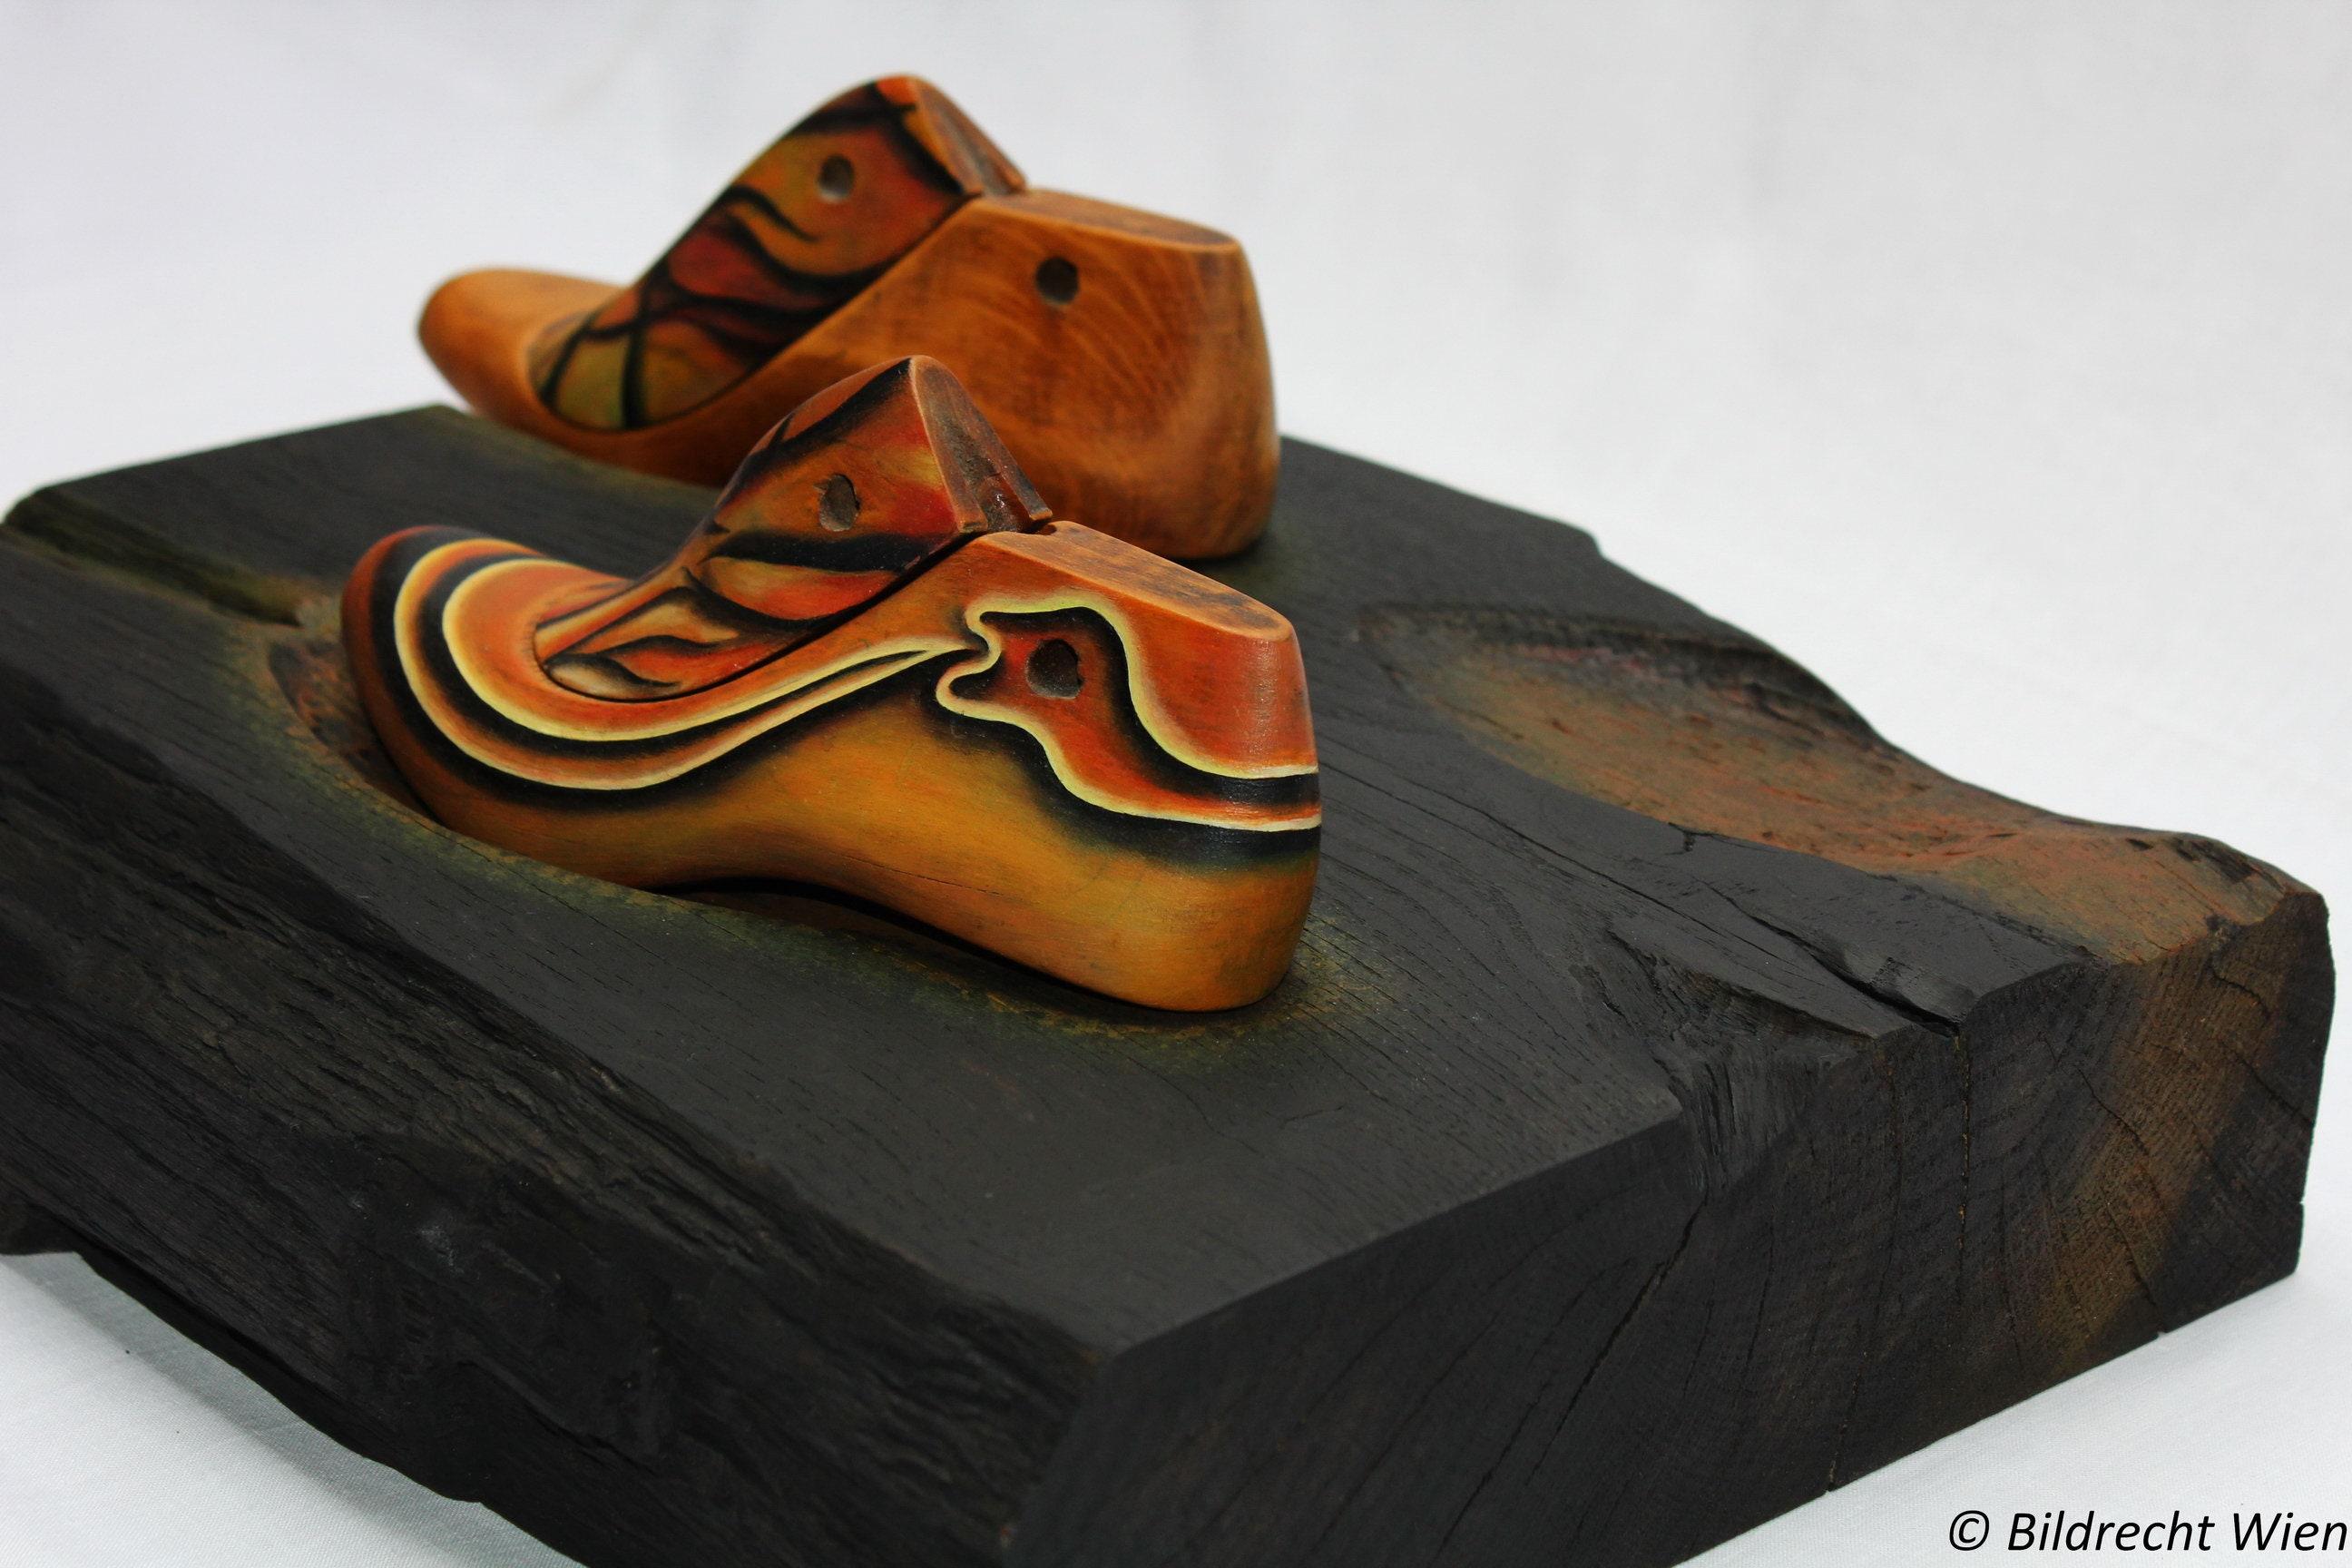 date vie empreinte empreintes date empreinte bois en Chaussure dure awqCXUBSWx